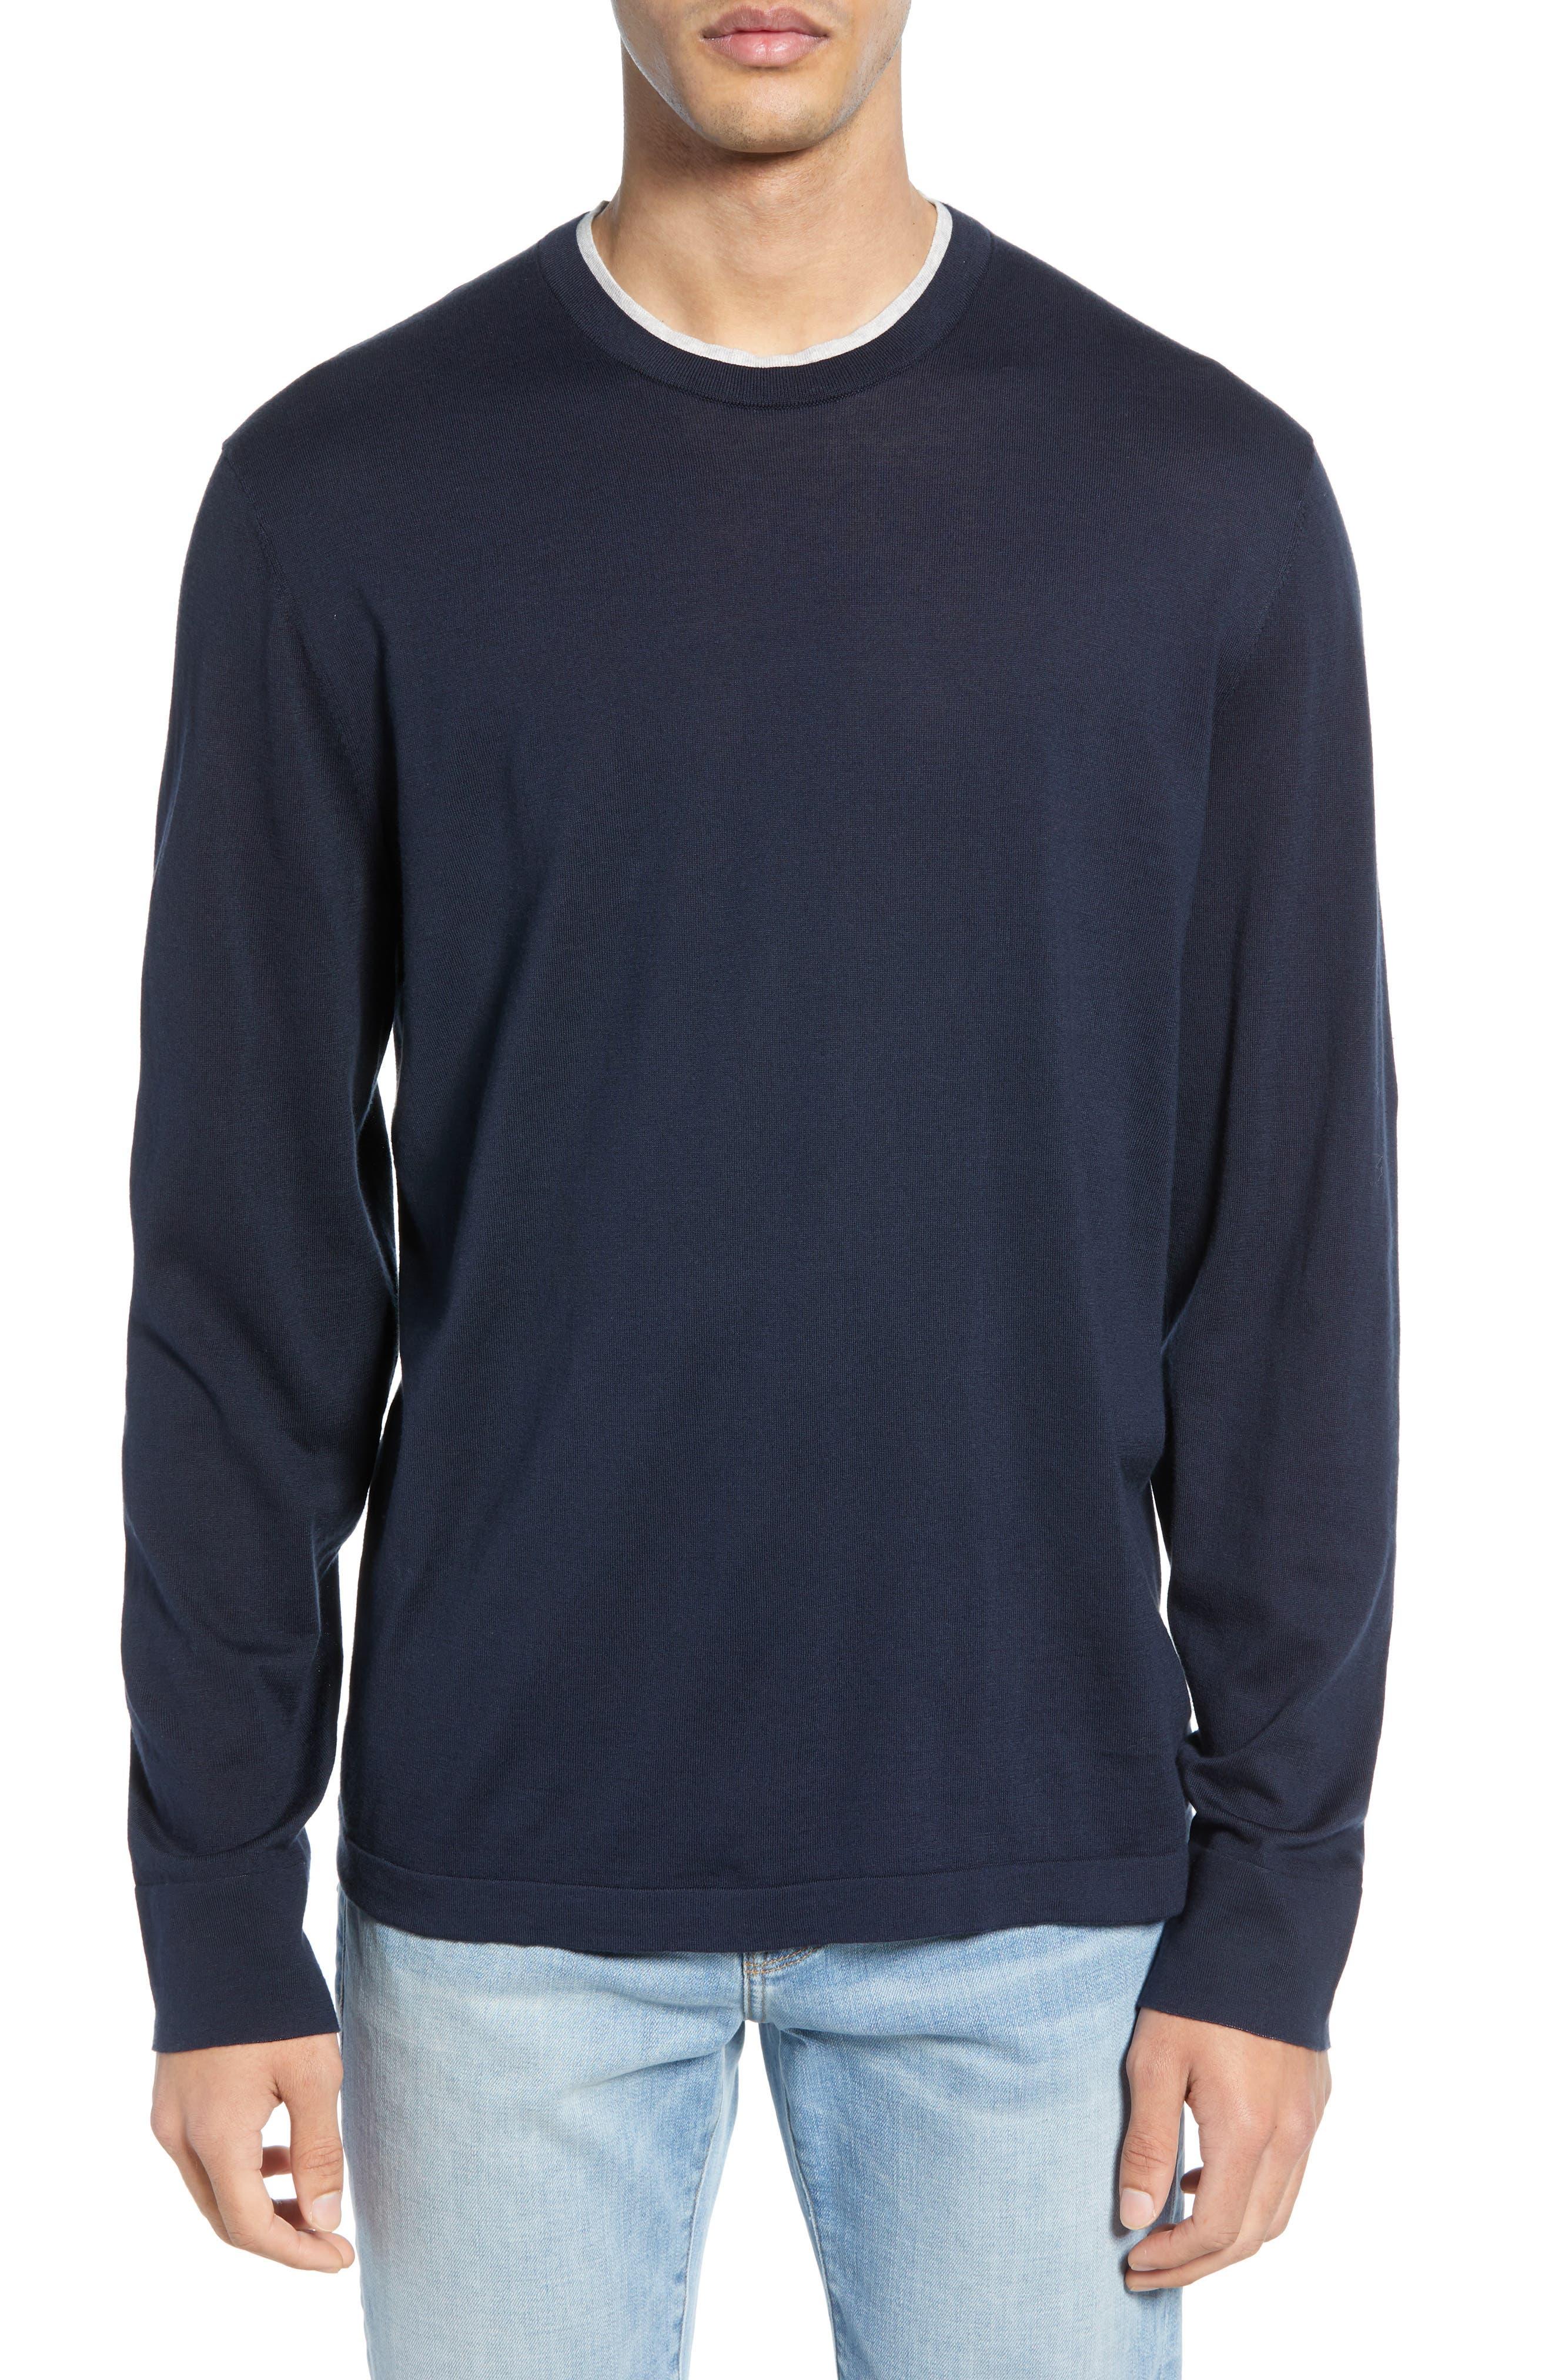 James Perse Slim Fit Cotton Crewneck Sweater, Blue